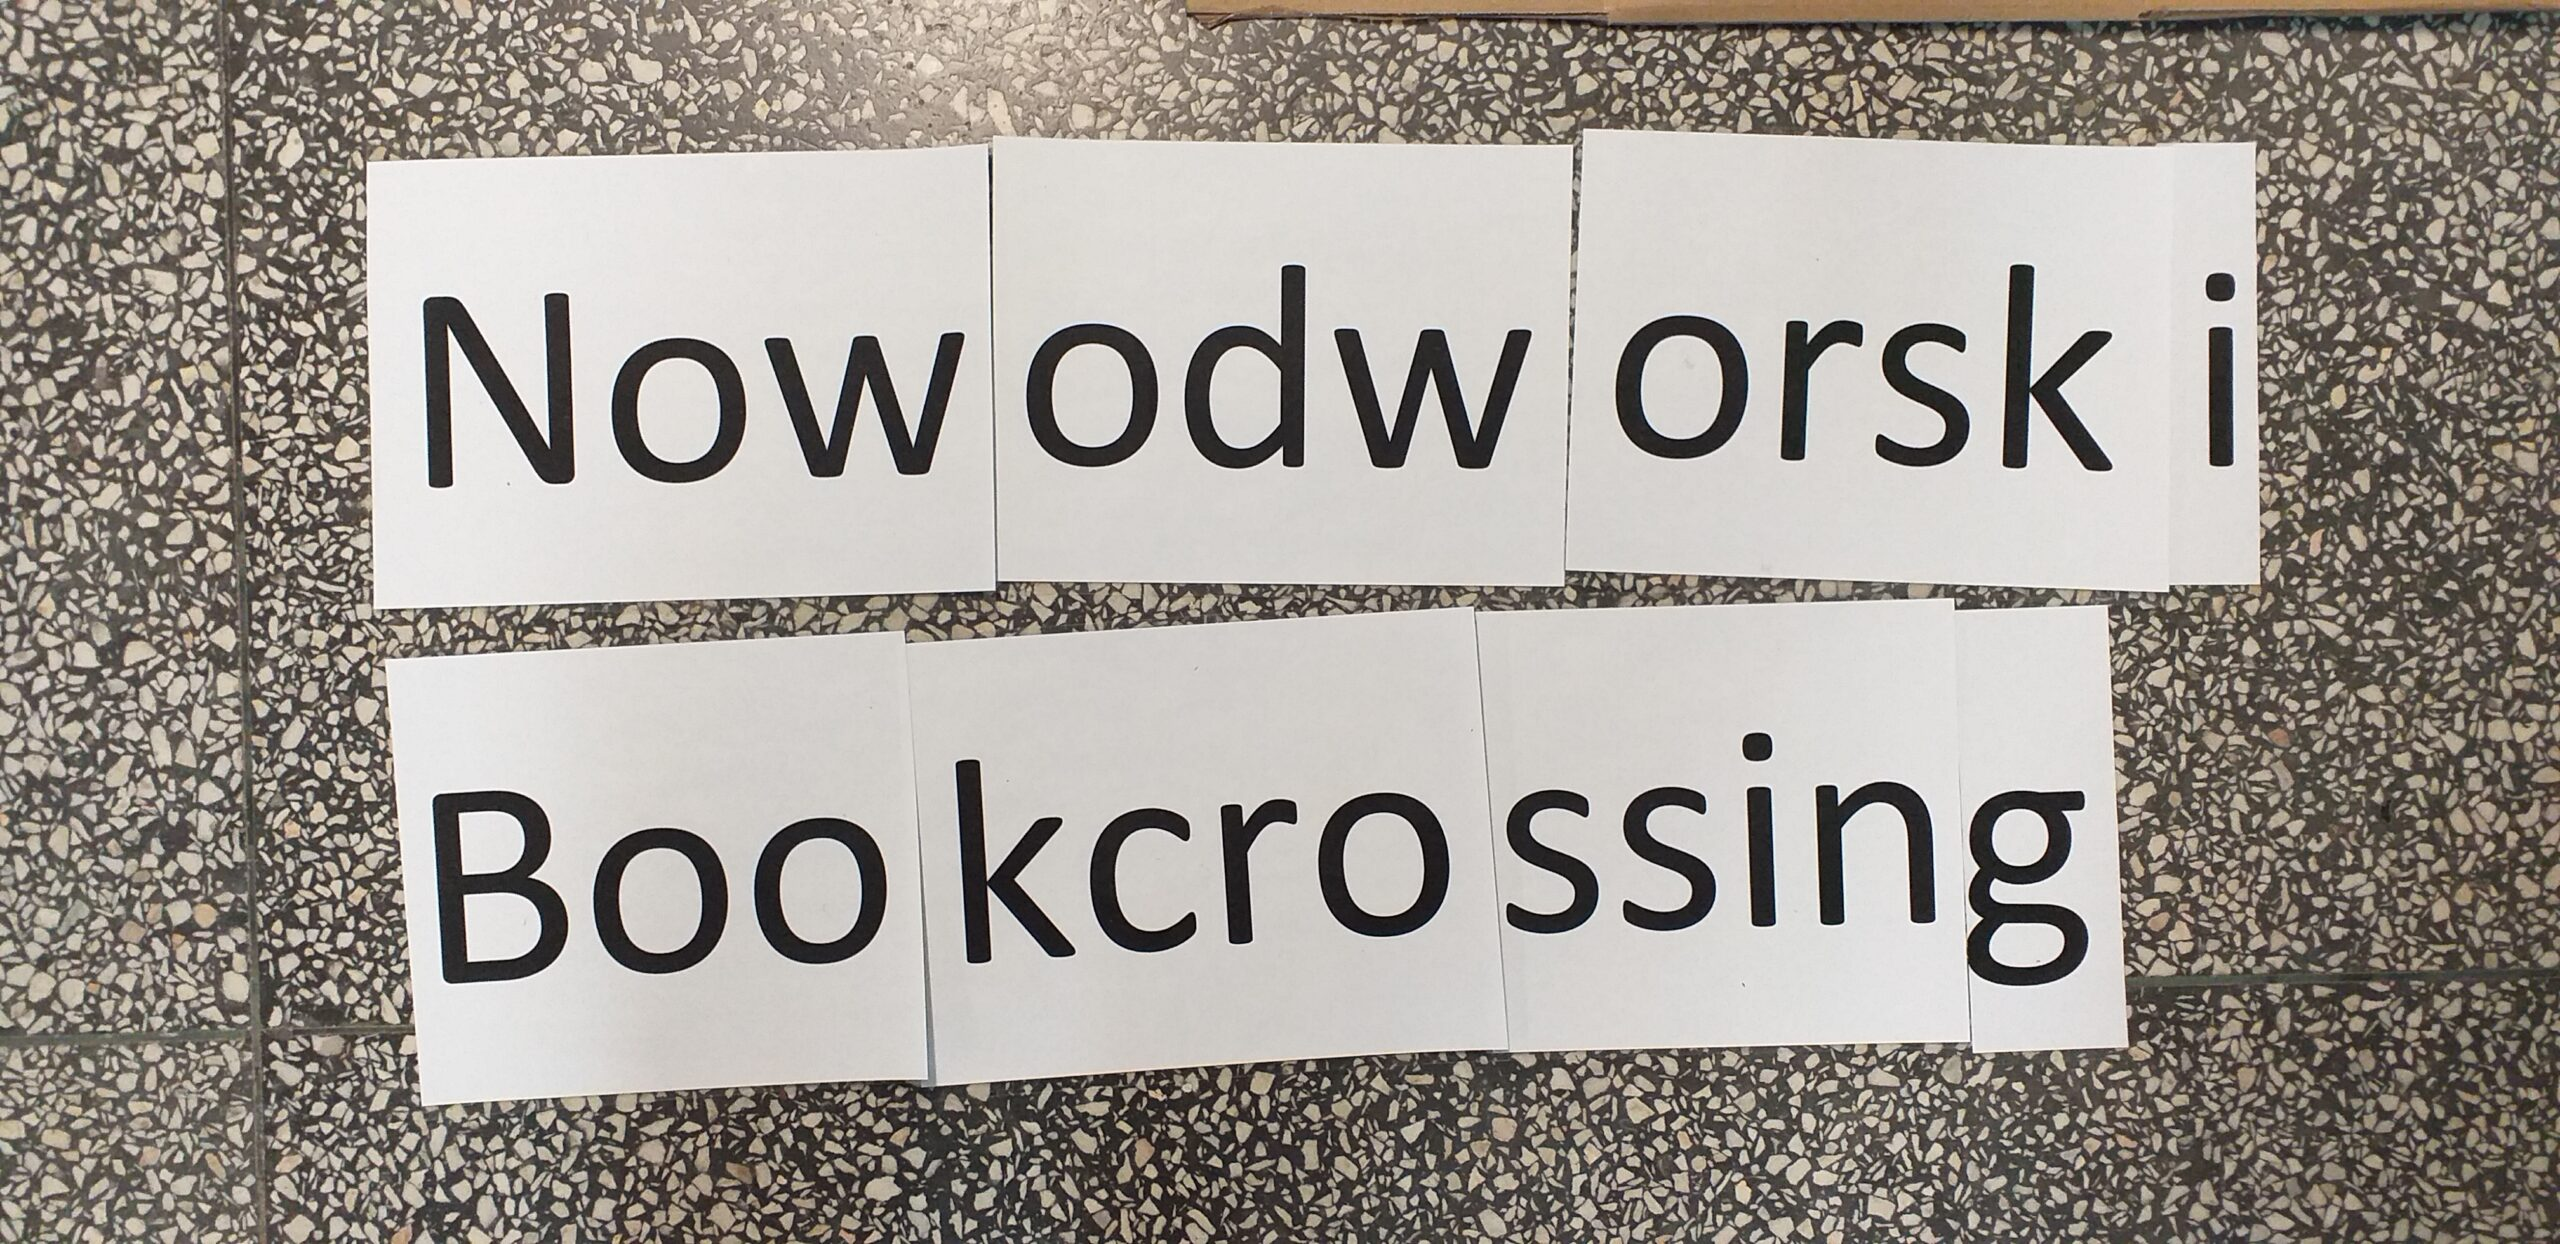 Nowodworski Bookcrossing